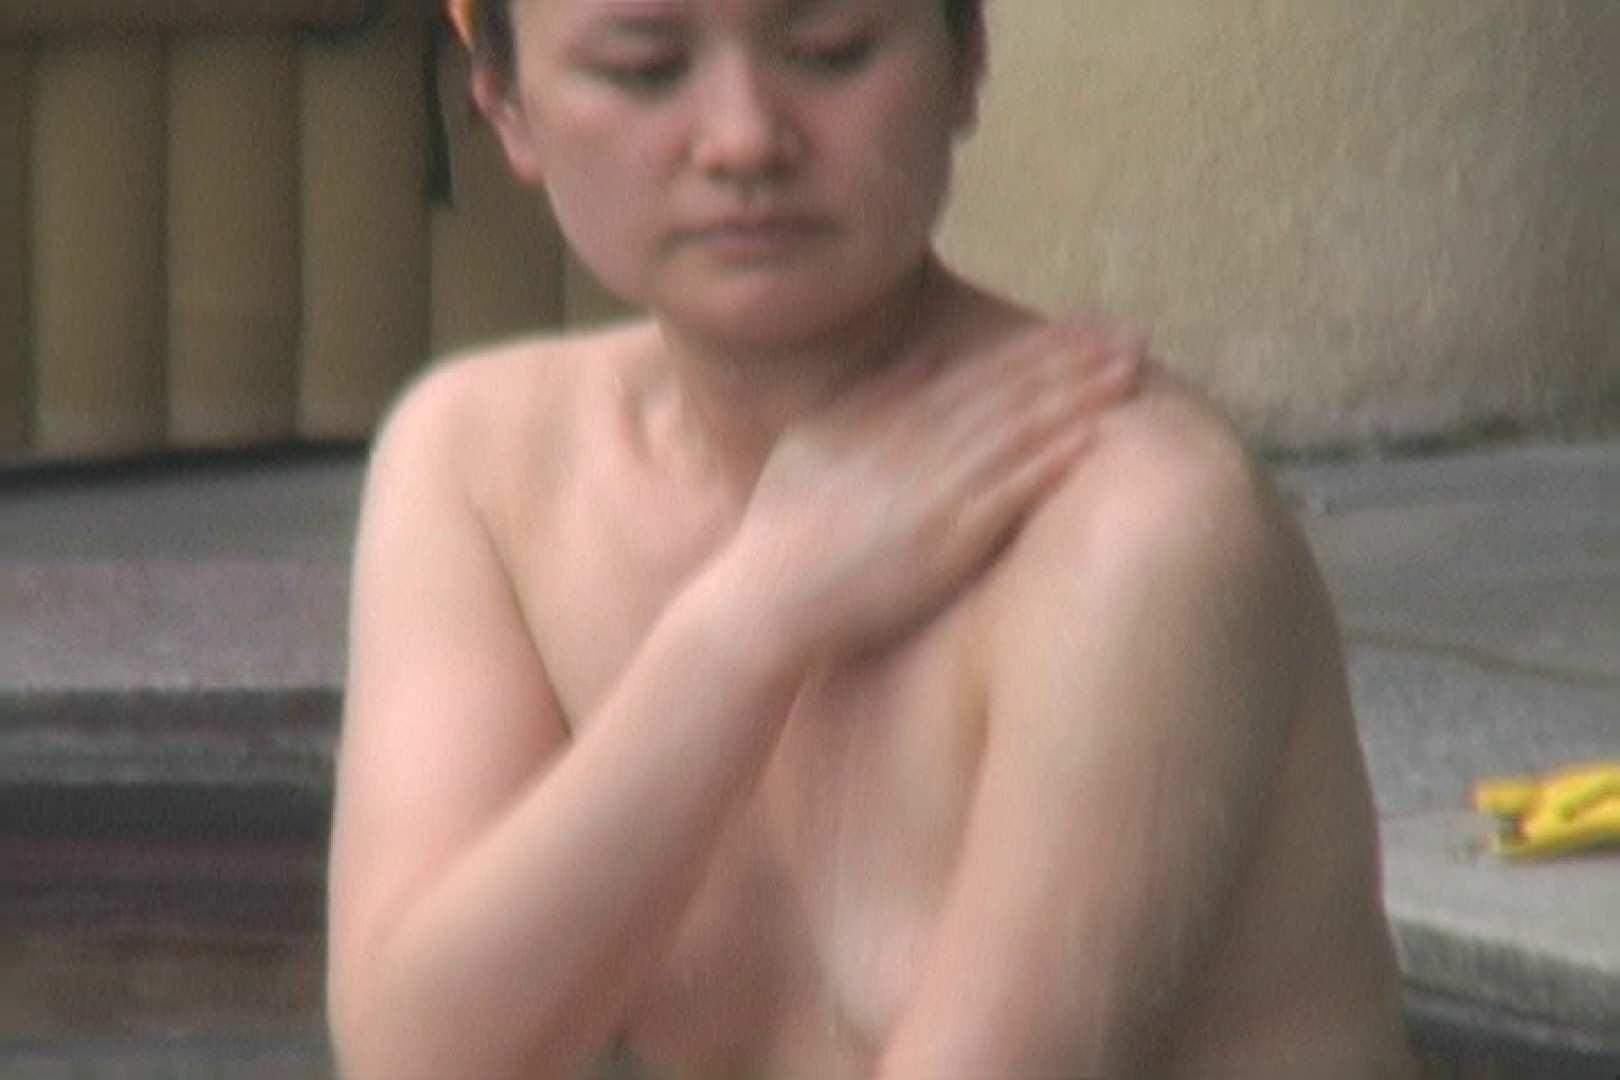 Aquaな露天風呂Vol.640 エッチな盗撮 セックス画像 101pic 74